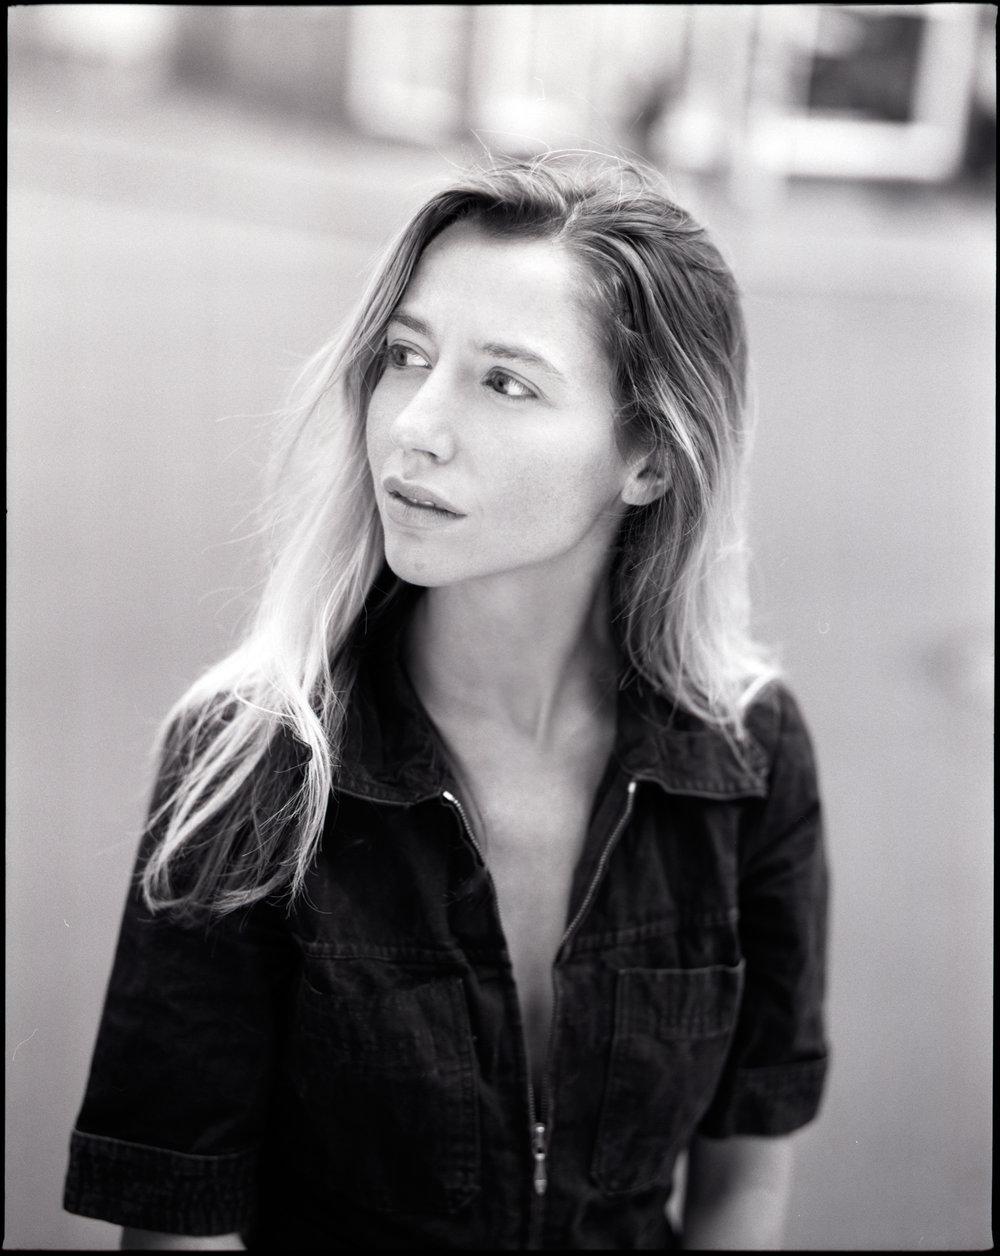 Hanna Leess